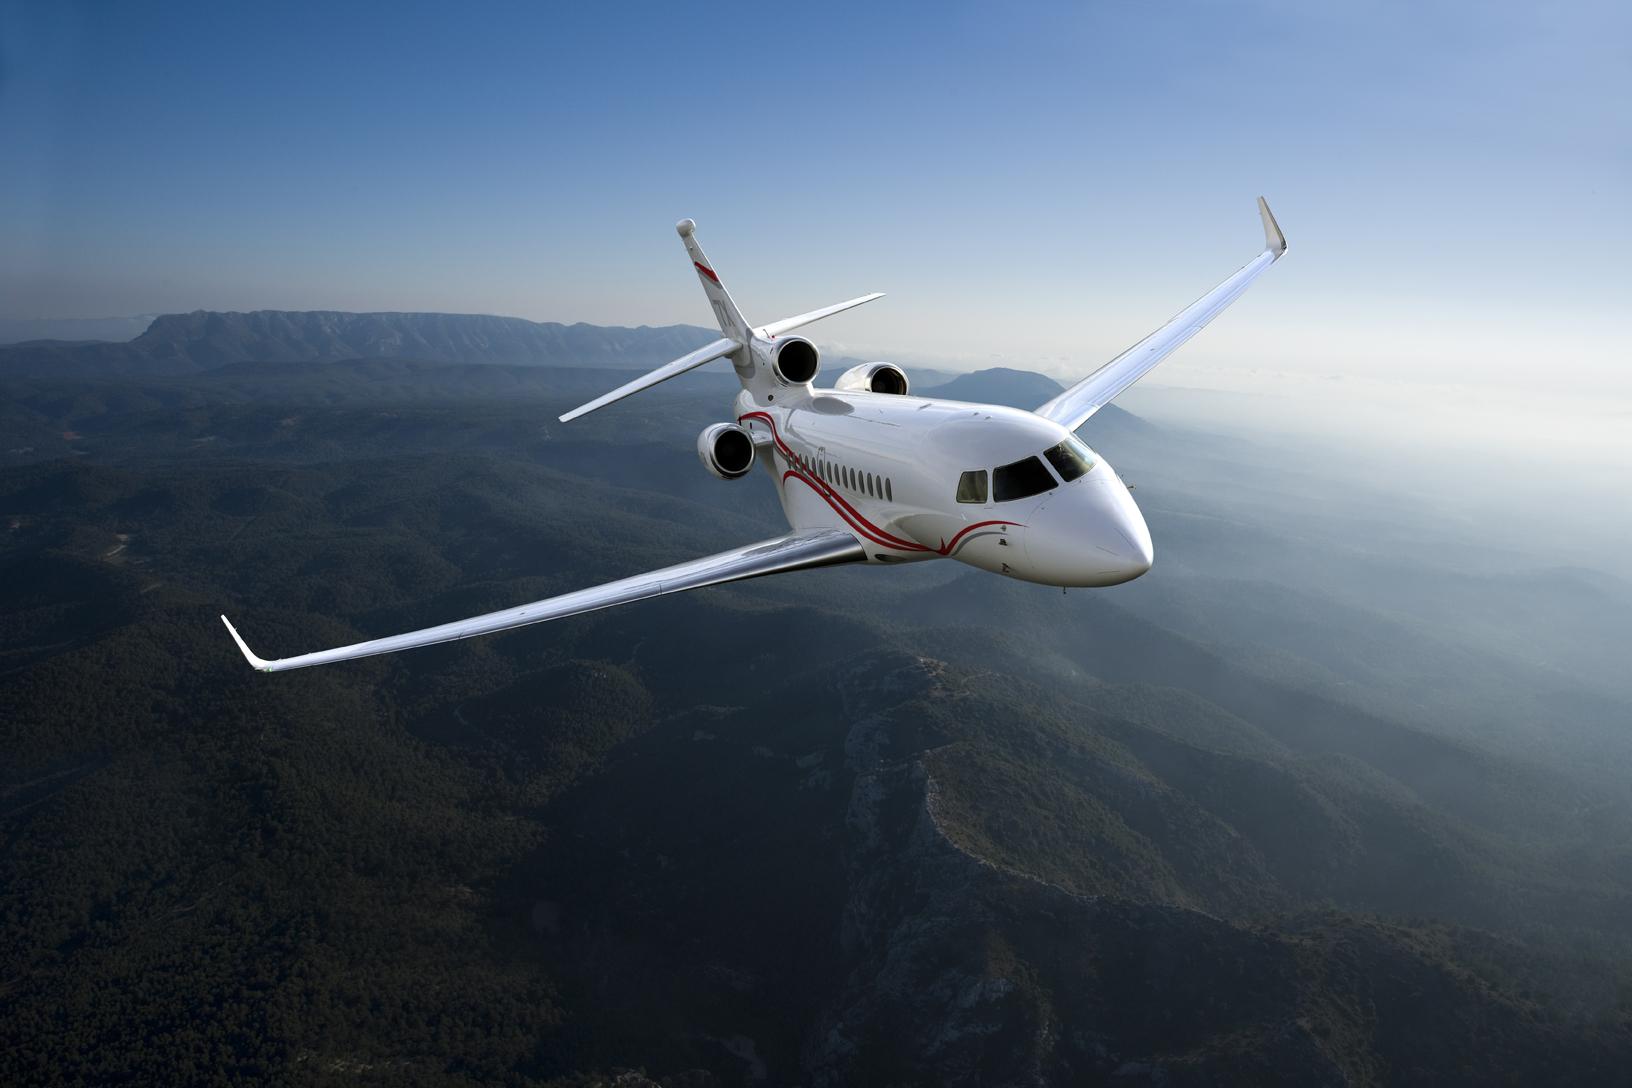 Dassault Falcon 7x Plane Sense Aviation